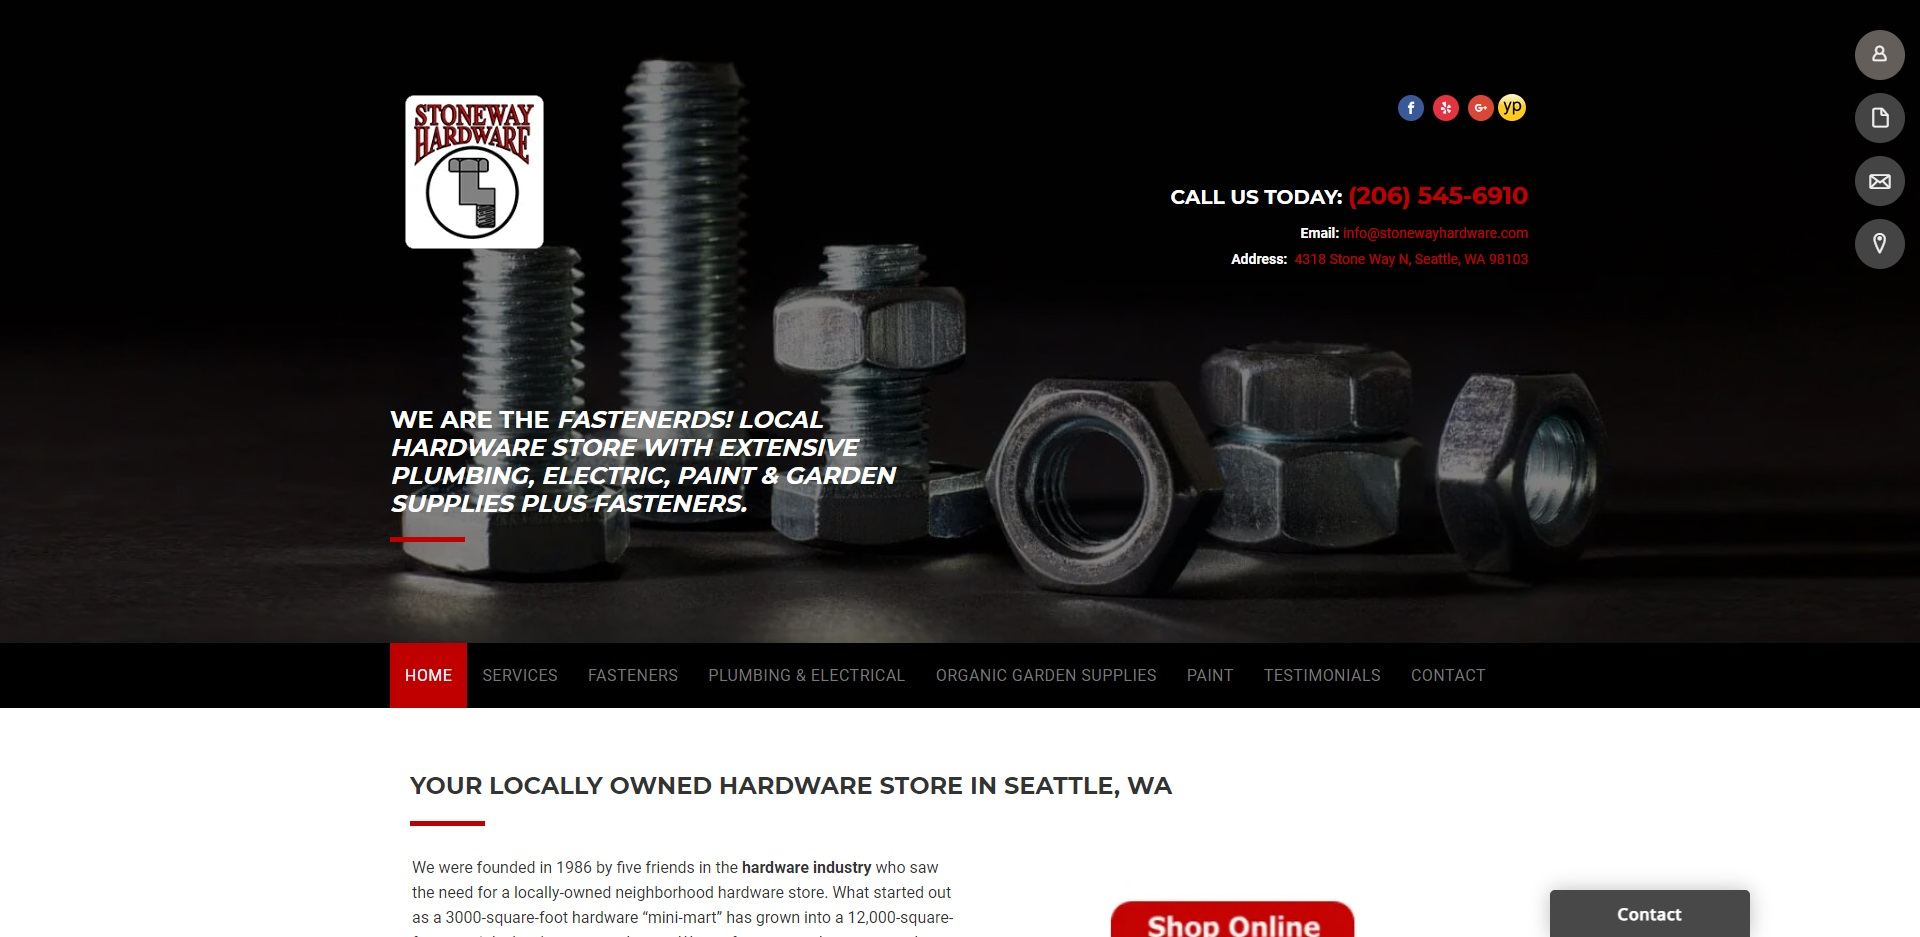 Best Hardware Stores in Seattle, WA